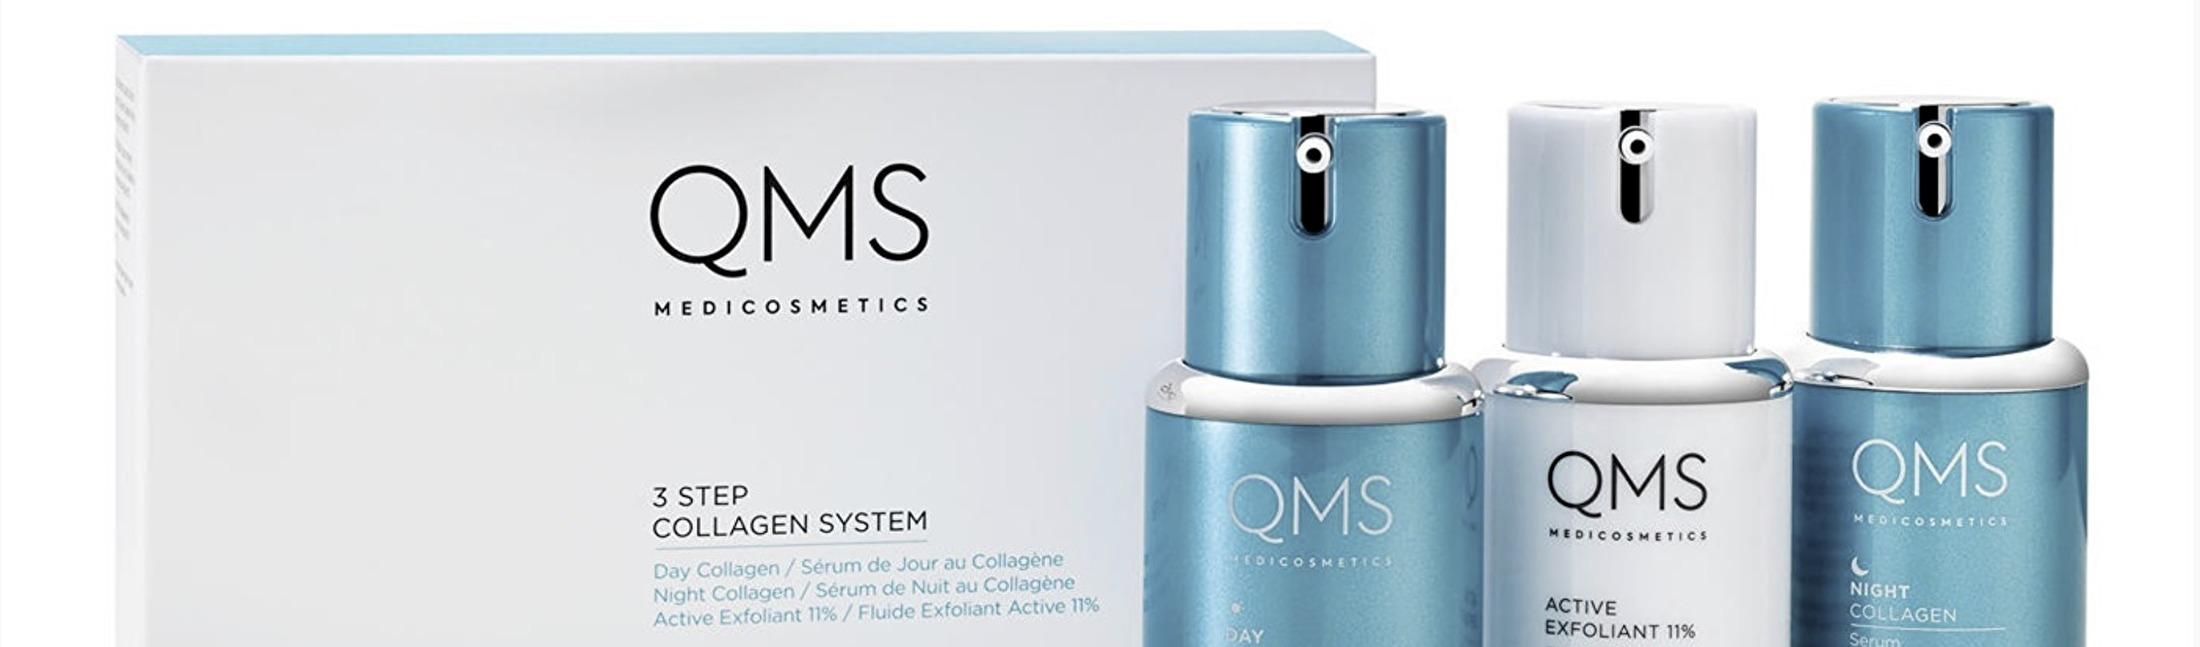 QMS Medicosmetics Collagen